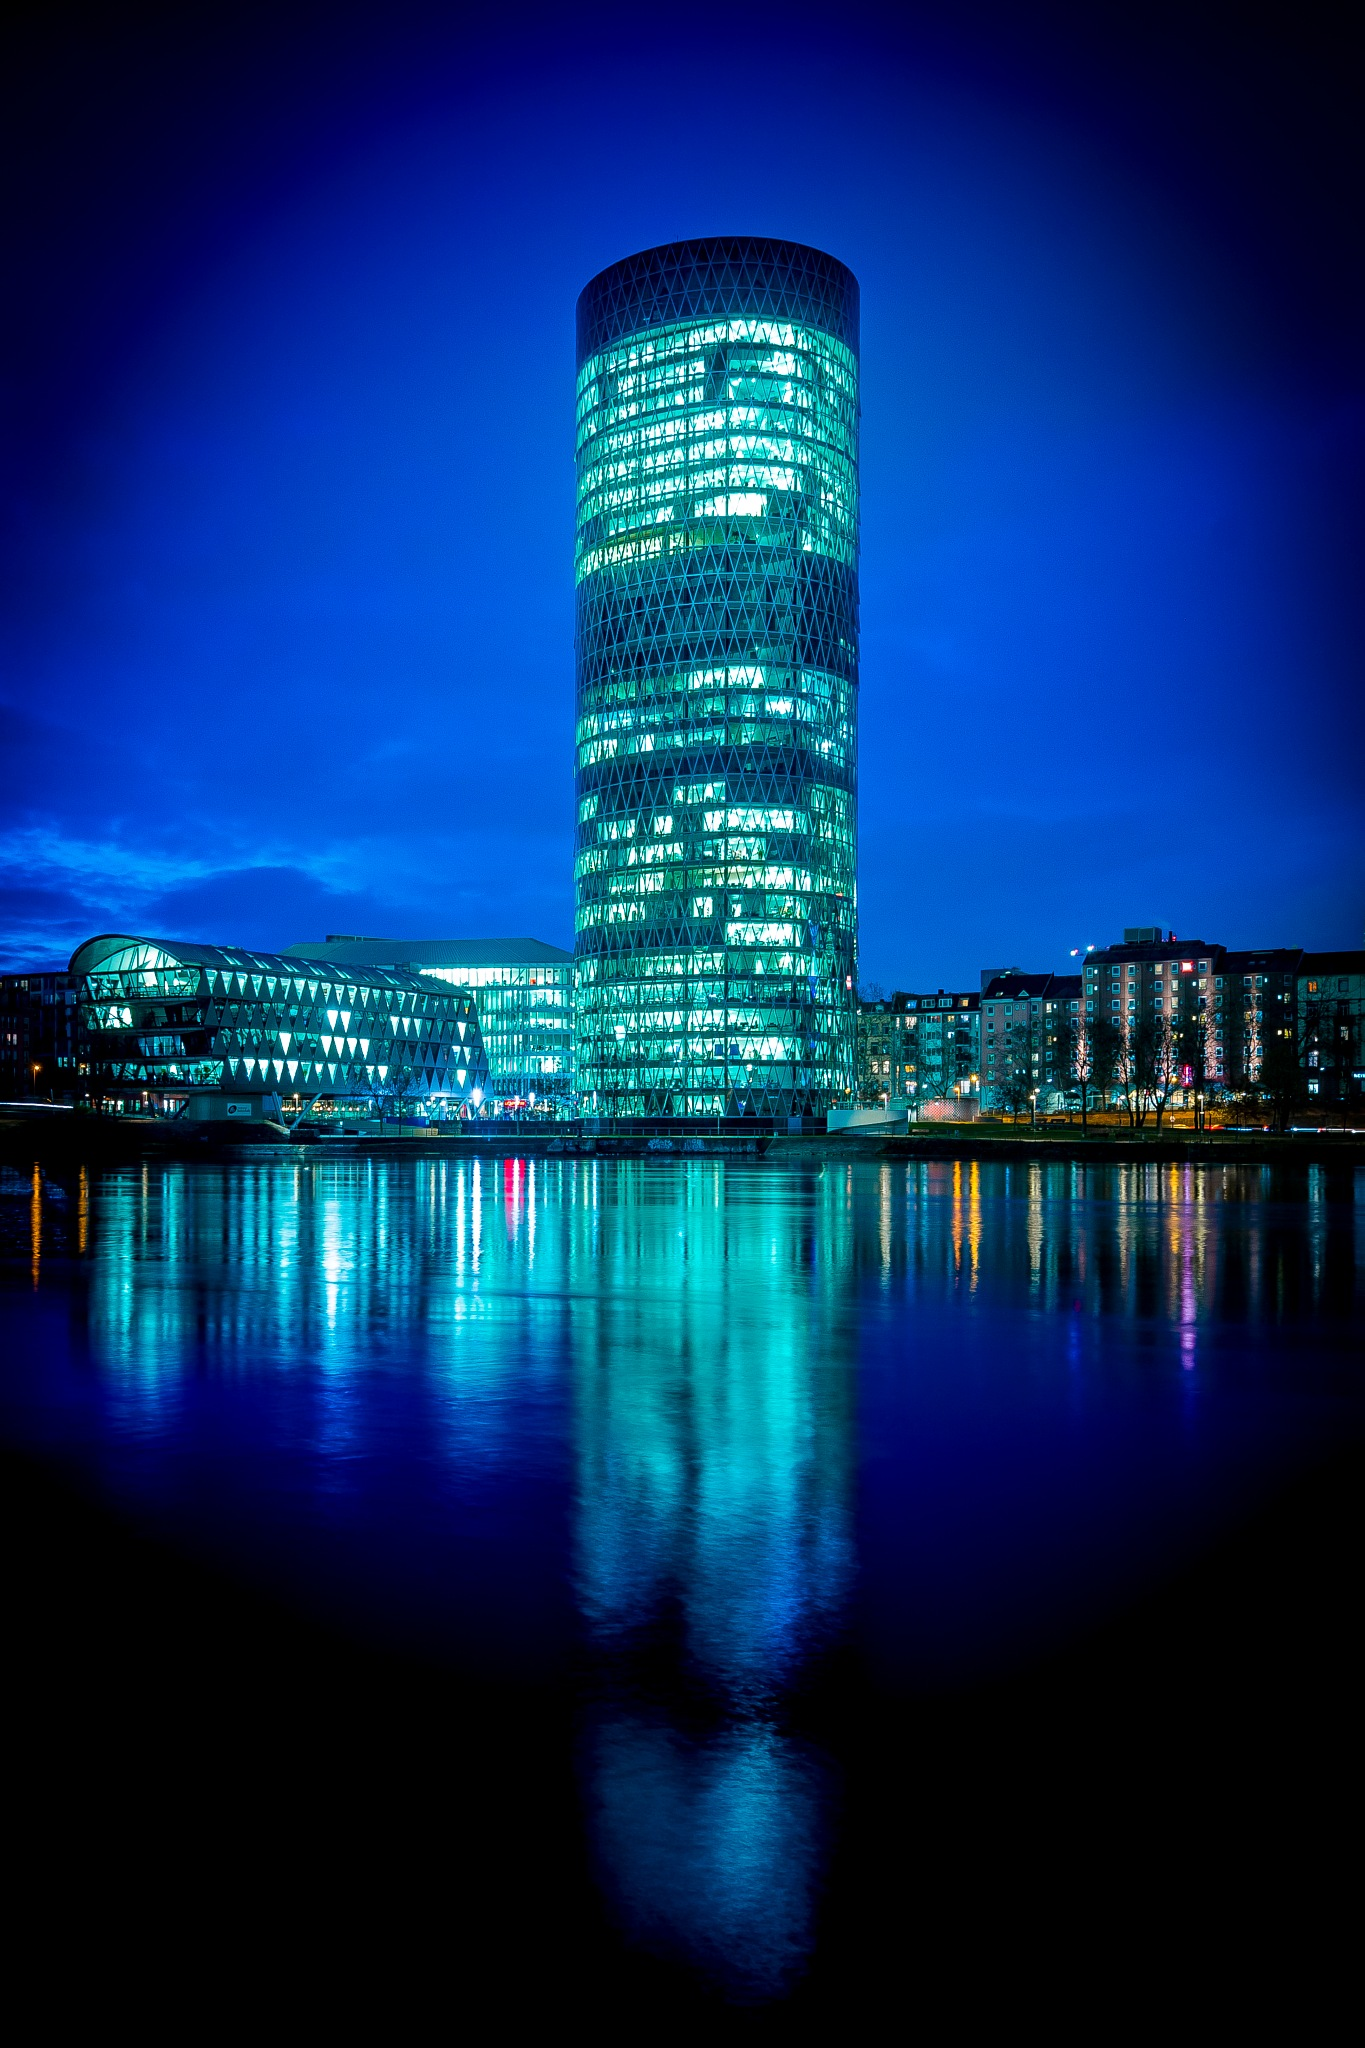 Frankfurt Geripptes by defconone